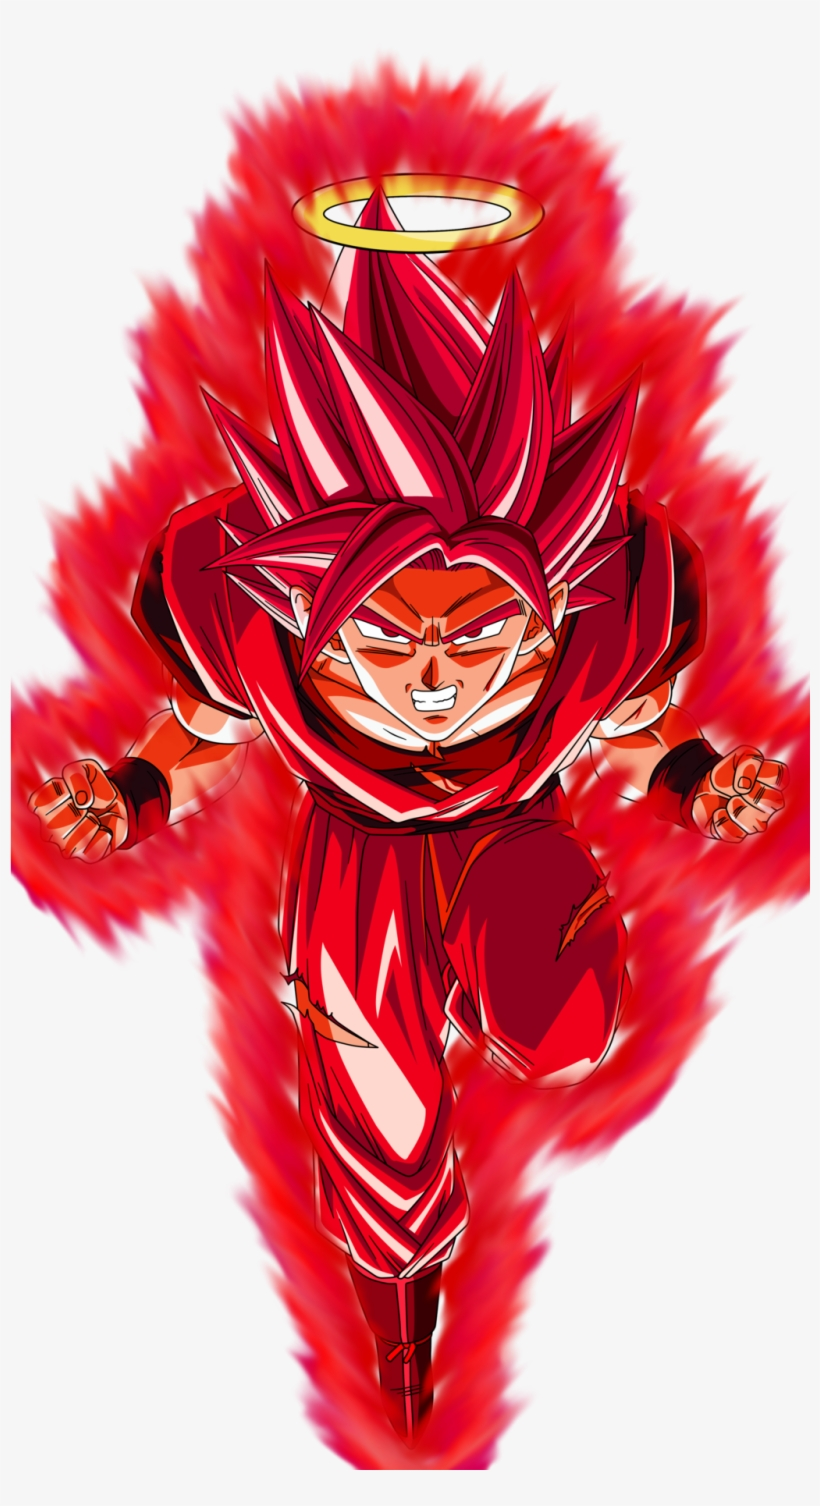 Super Kaioken Goku Aura By Inglip007-d5whzmr - Dragon Ball Goku Super Kaioken, transparent png #253799